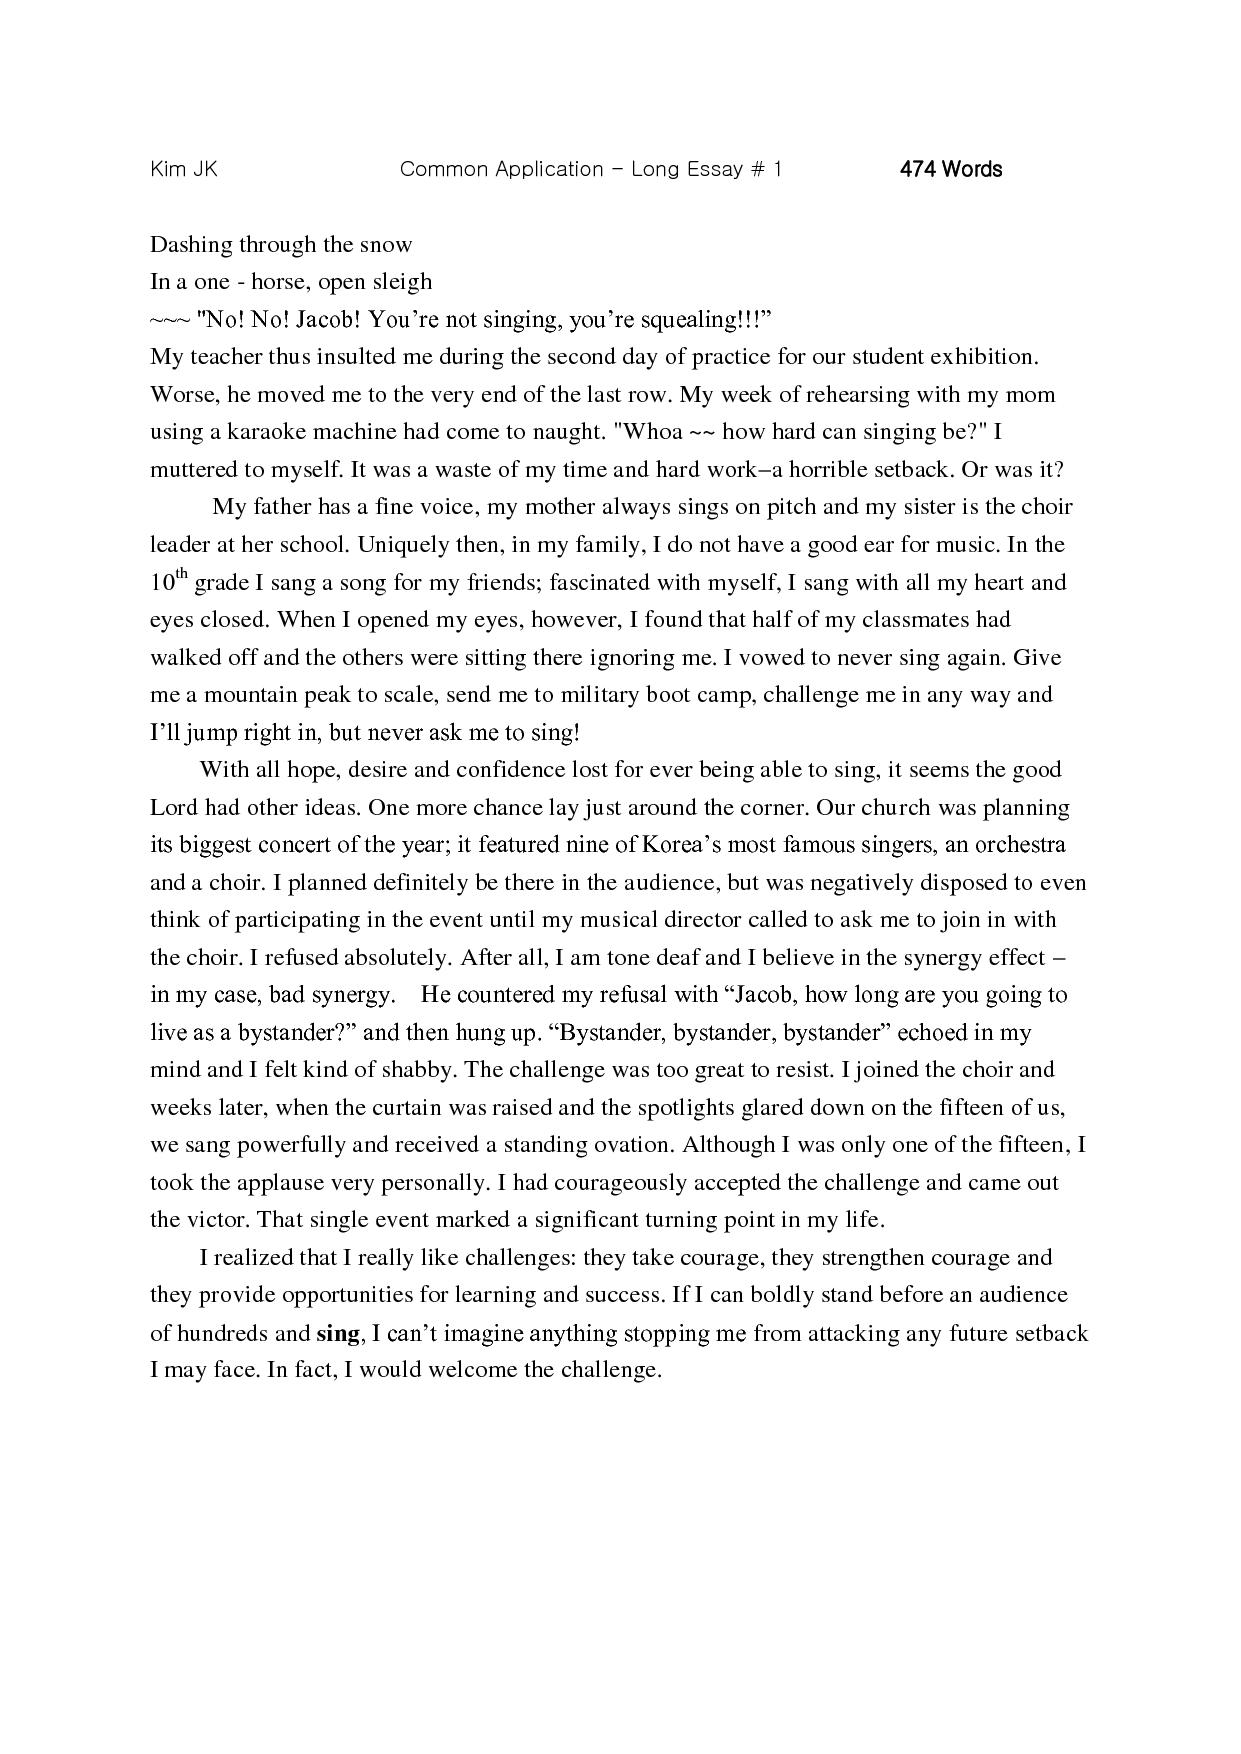 001 Essay Example Brilliant Ideas Of Collegepplication Examples Format Targer Golden Dragon Fantastic Good Commonpp Essays Successful Dreaded Common App Dartmouth Reddit Ivy League Full